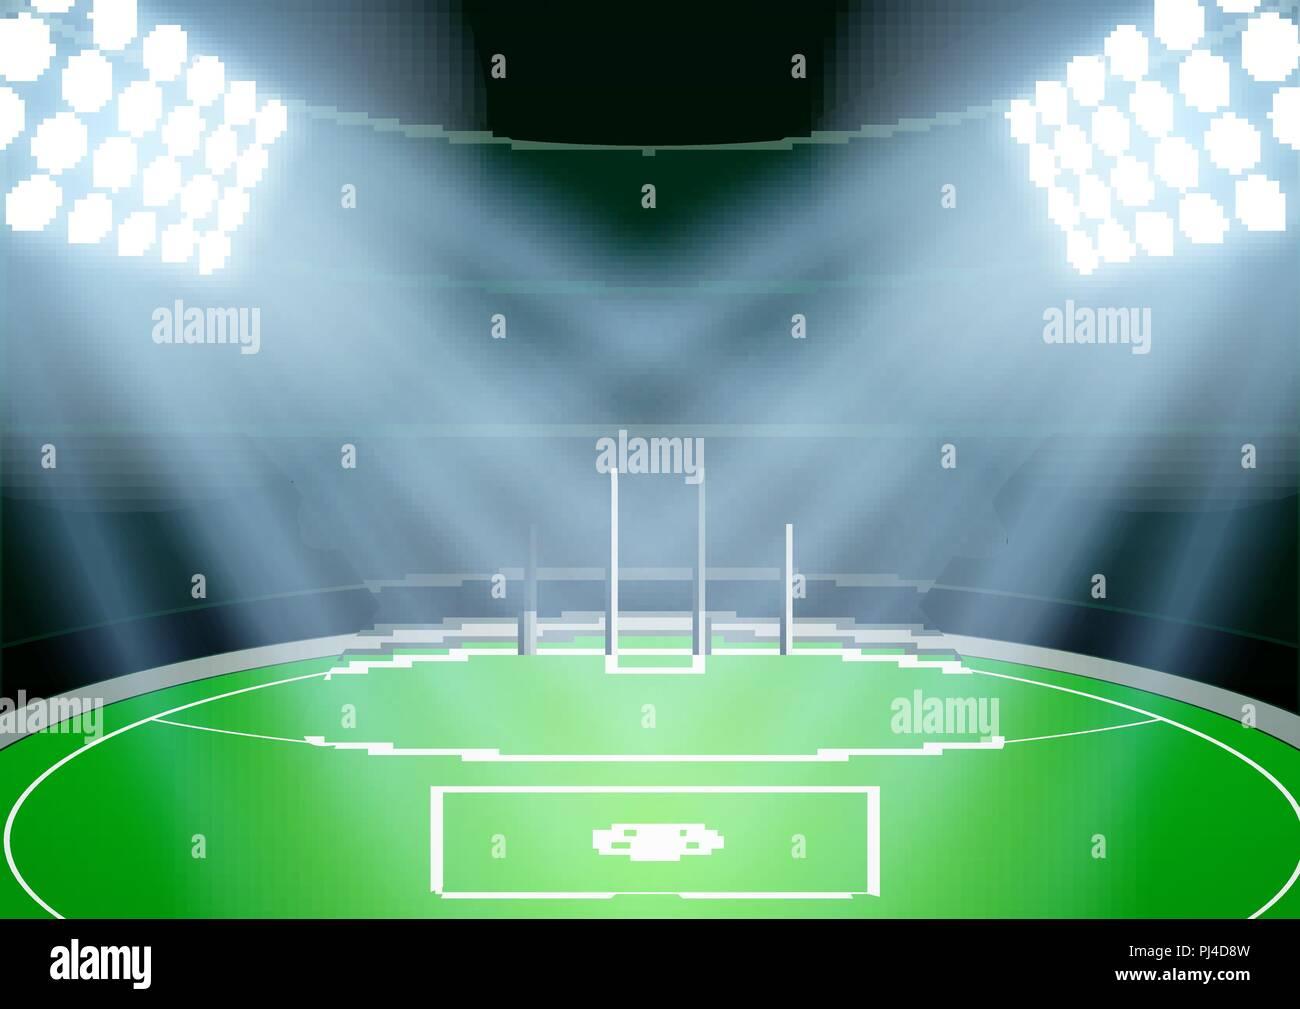 background for australian football stadium stock vector image art alamy https www alamy com background for australian football stadium image217686473 html